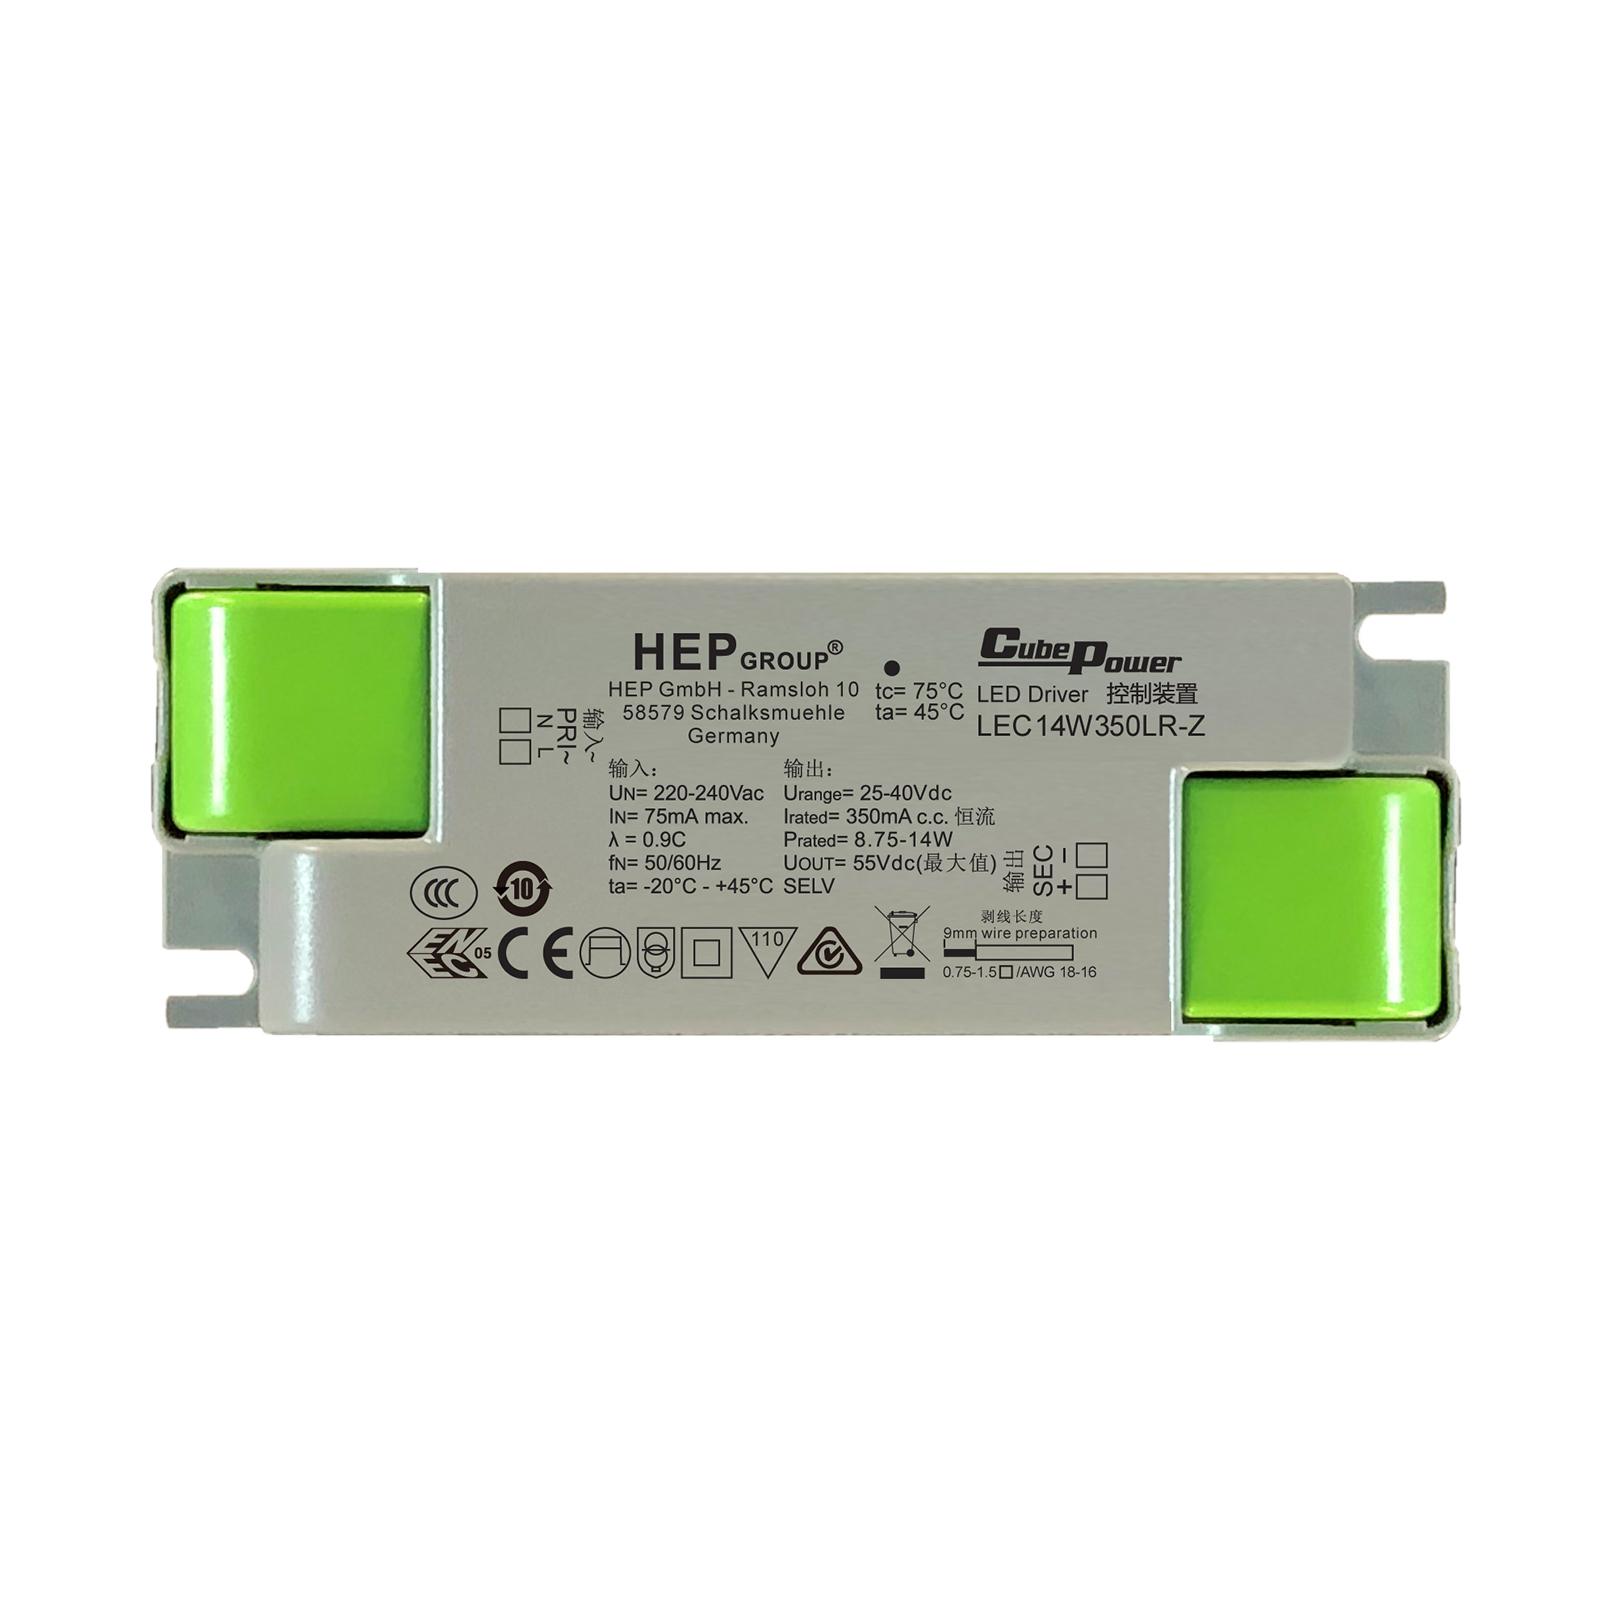 LED driver LEC, 14 W, 350 mA, CC